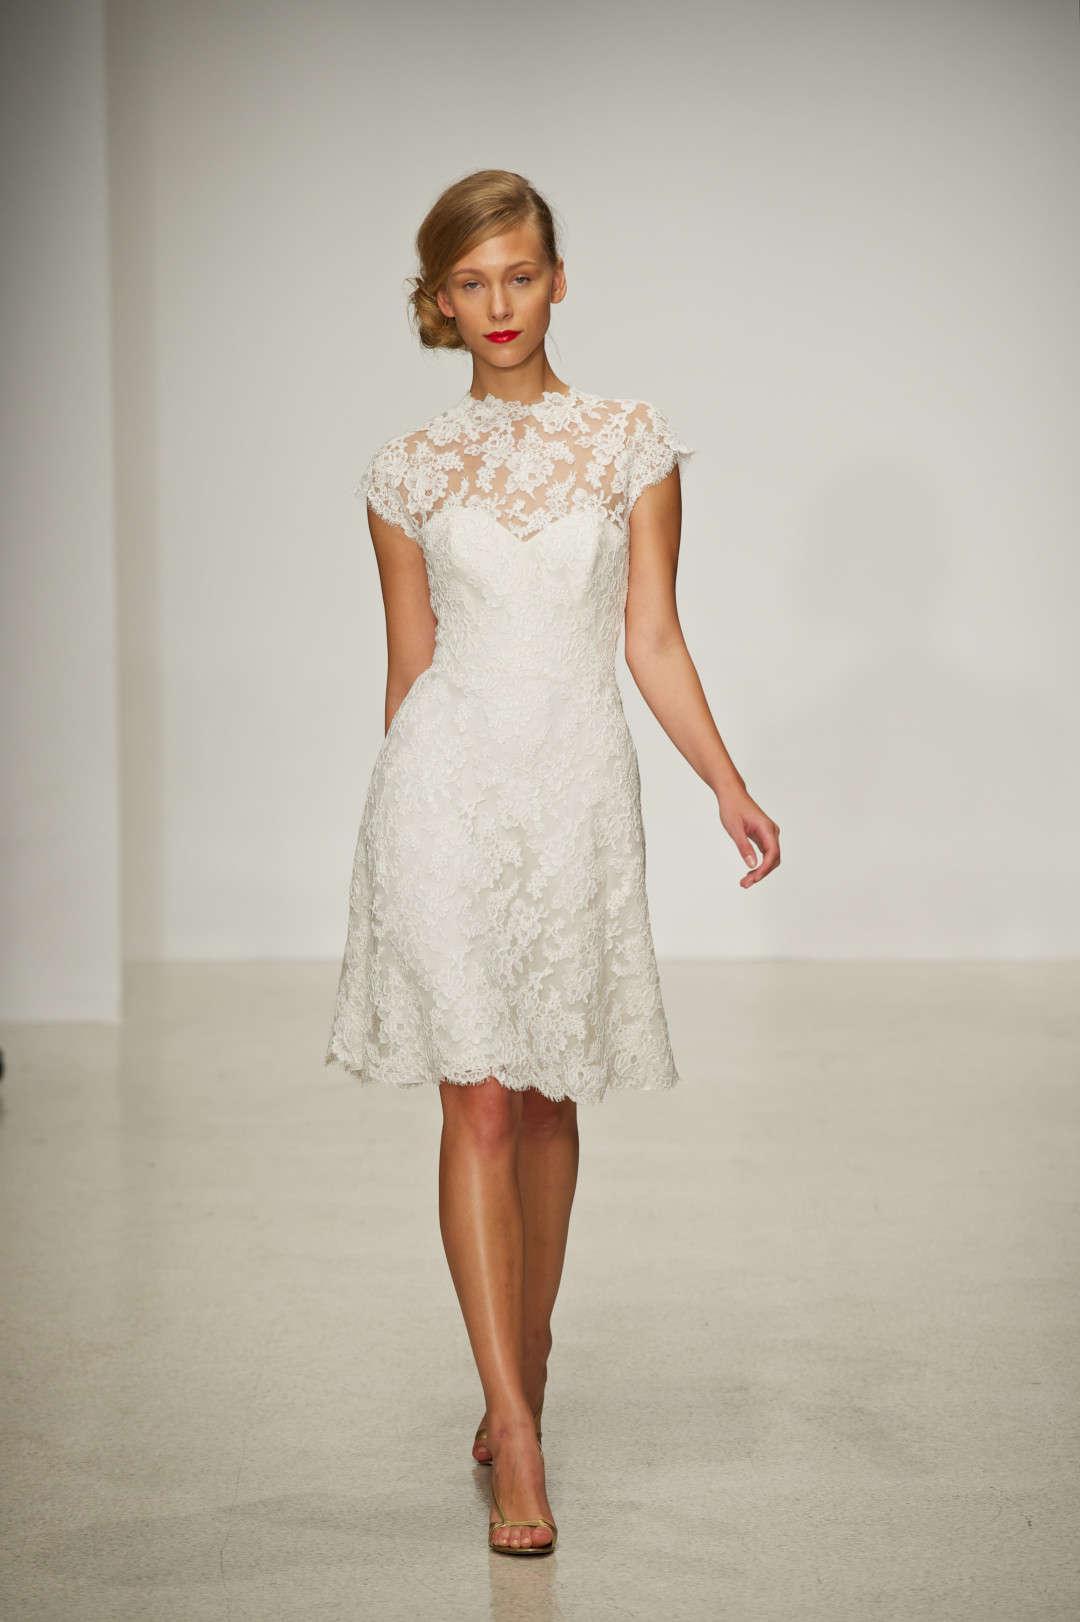 Discount a line wedding dresses 2014 spring amazing high for Knee high wedding dresses